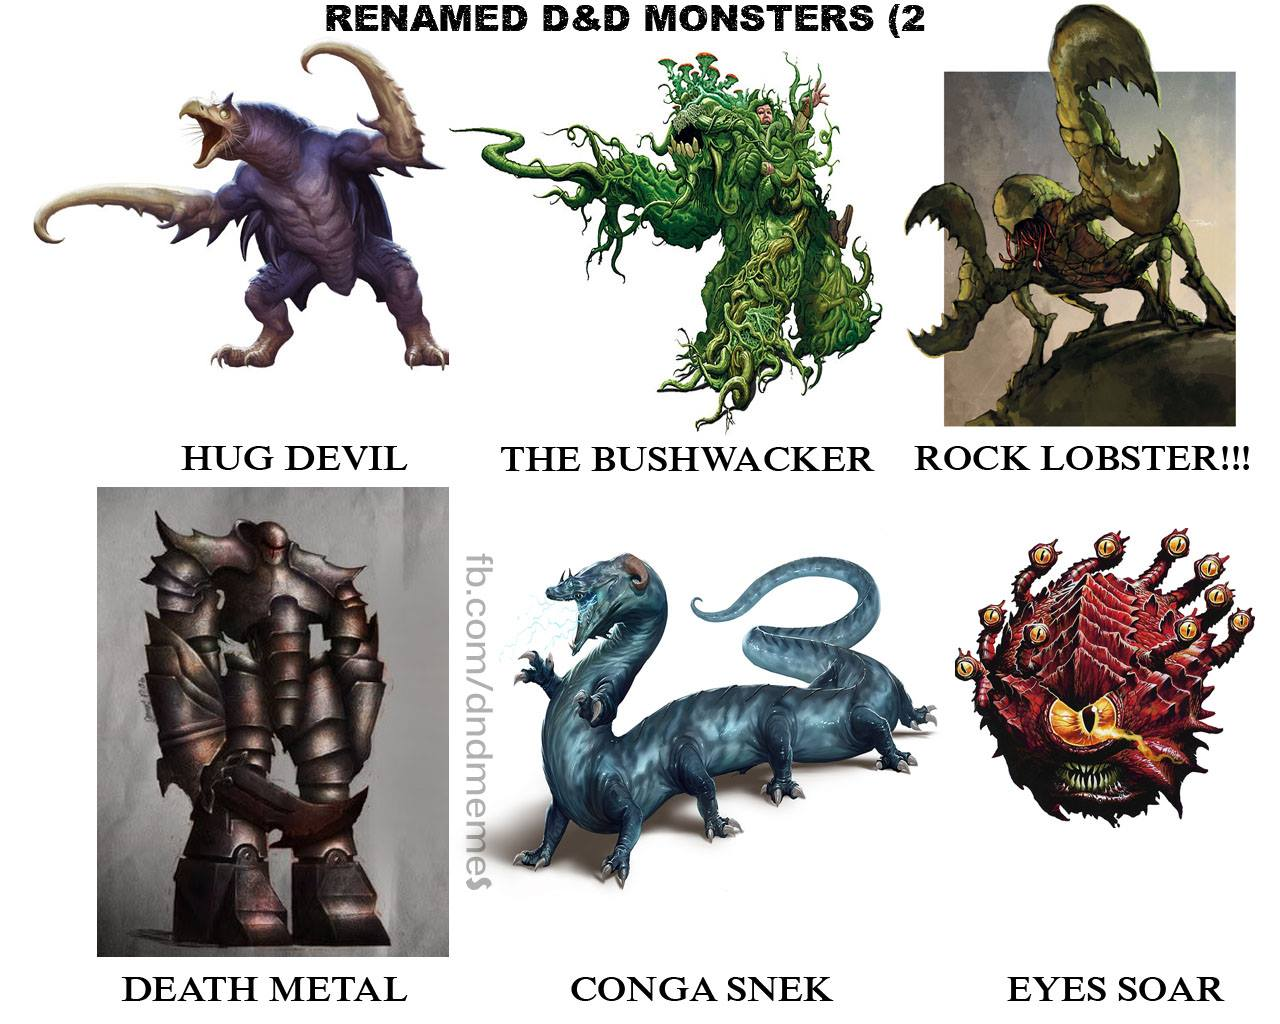 D&D Memes: renamed monsters